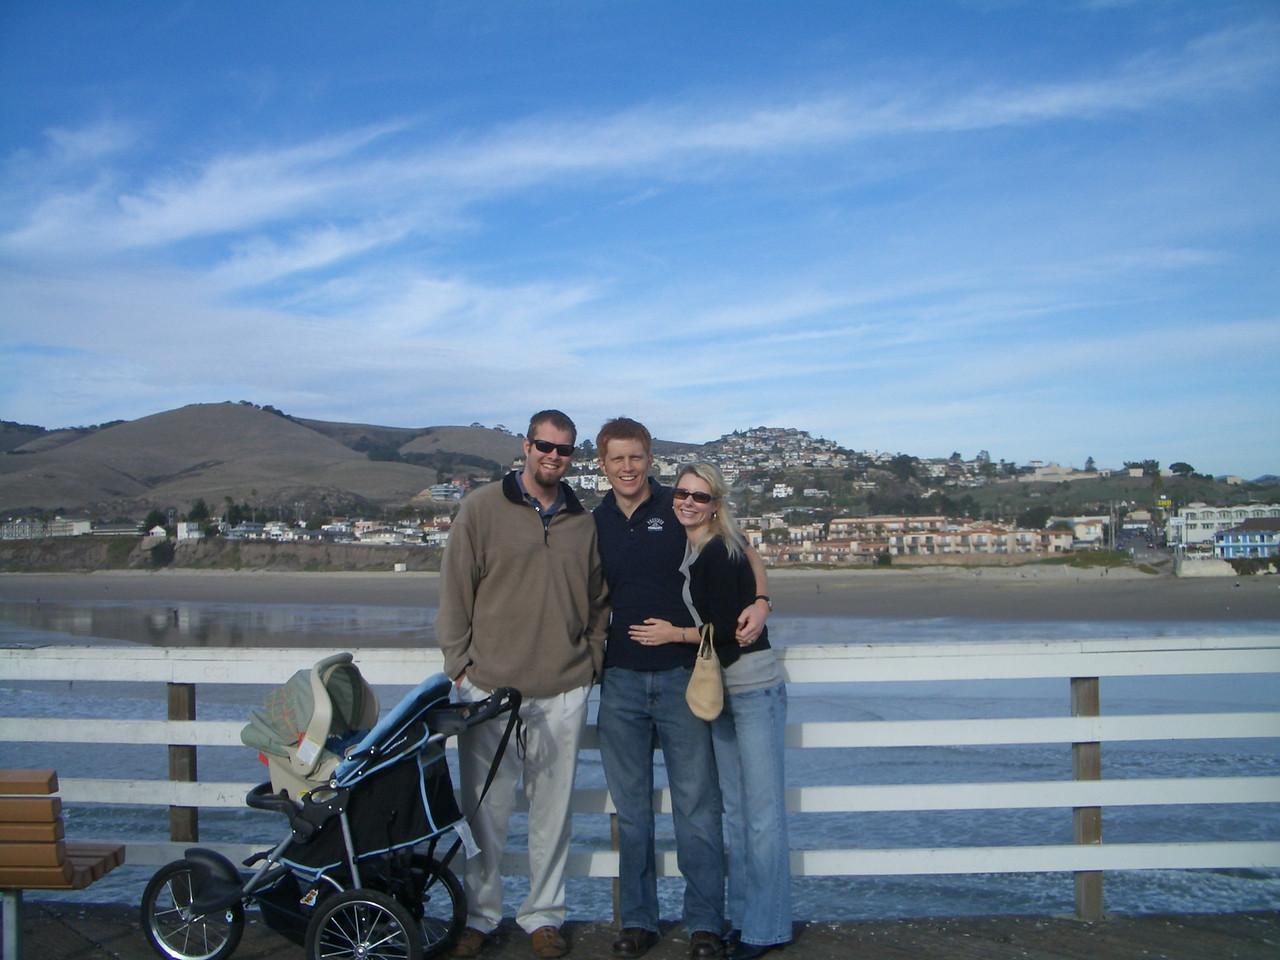 Tony, Cody and our friends Stefanie and Joel in Santa Barbara. 1/2/07